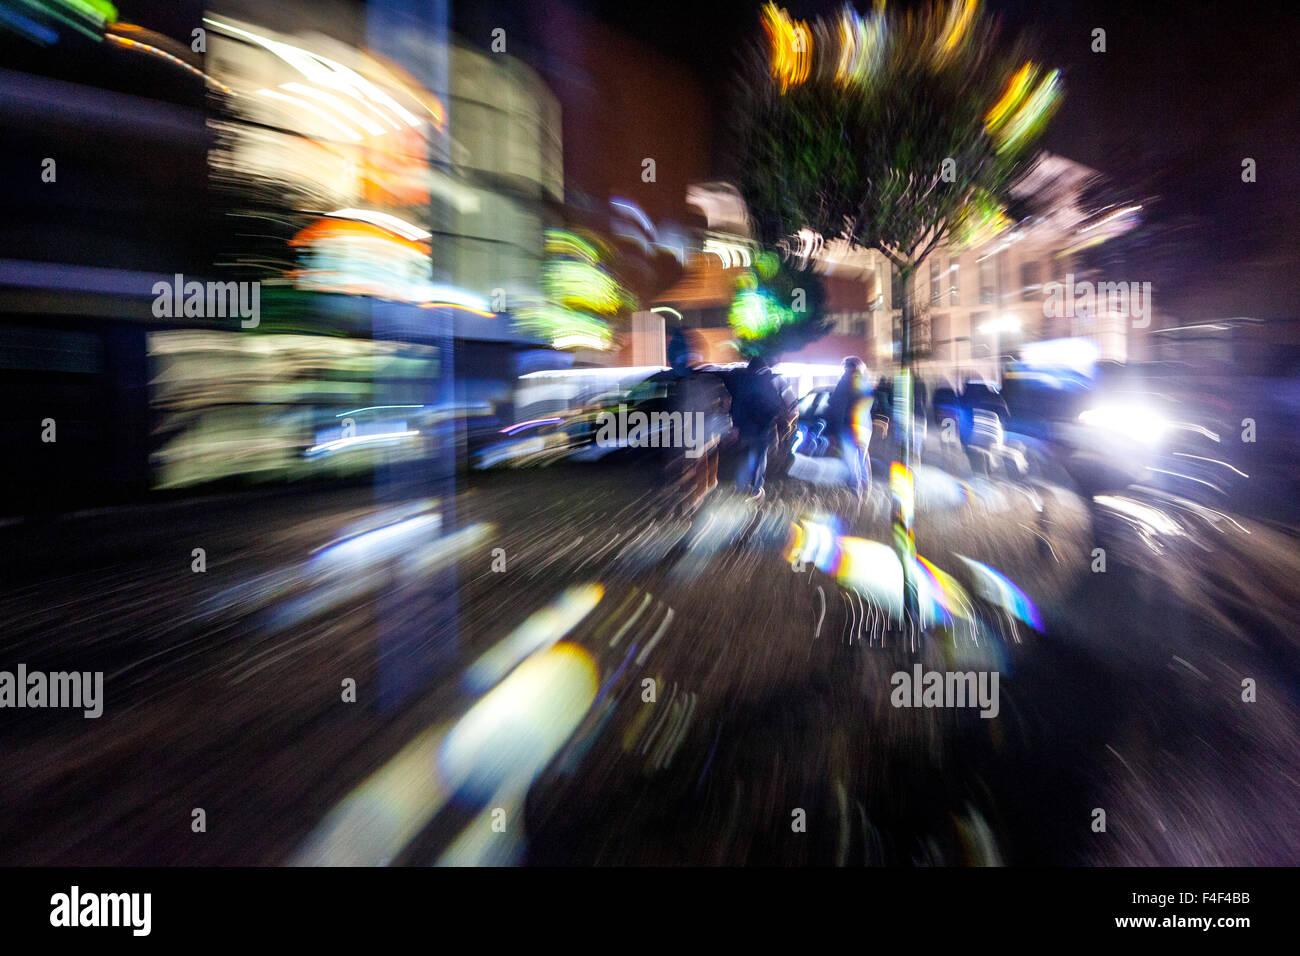 blur city lights night street Prague motion, Czech Republic - Stock Image